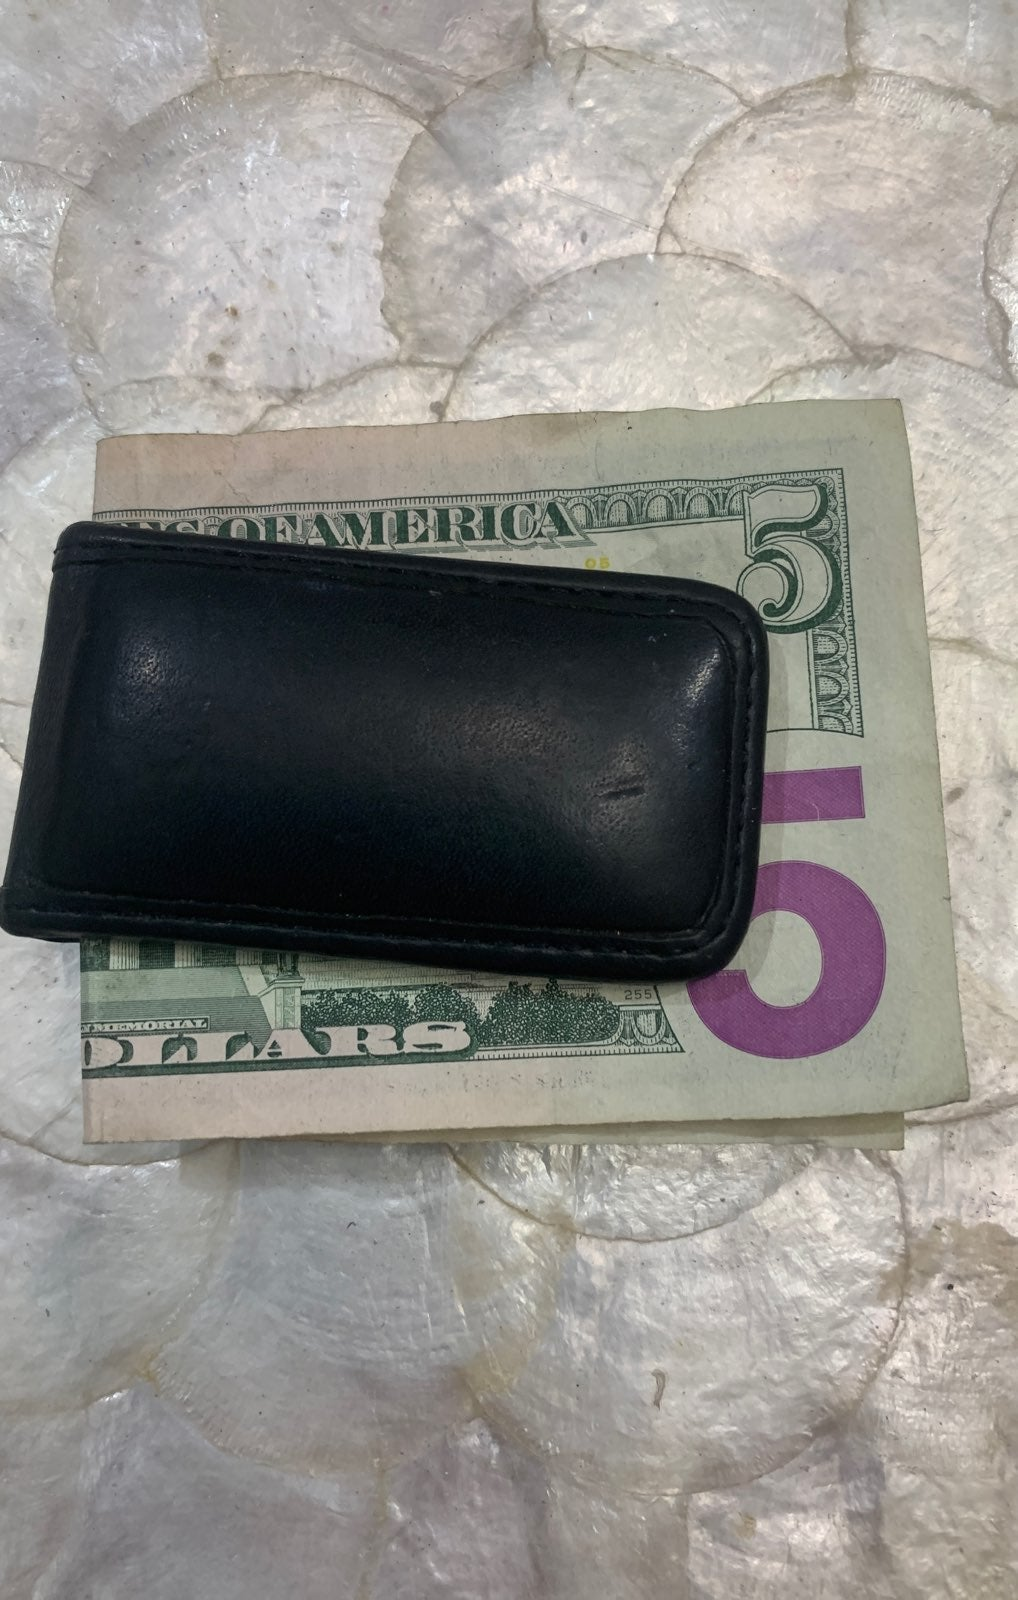 Cole Haan magnetic money clip